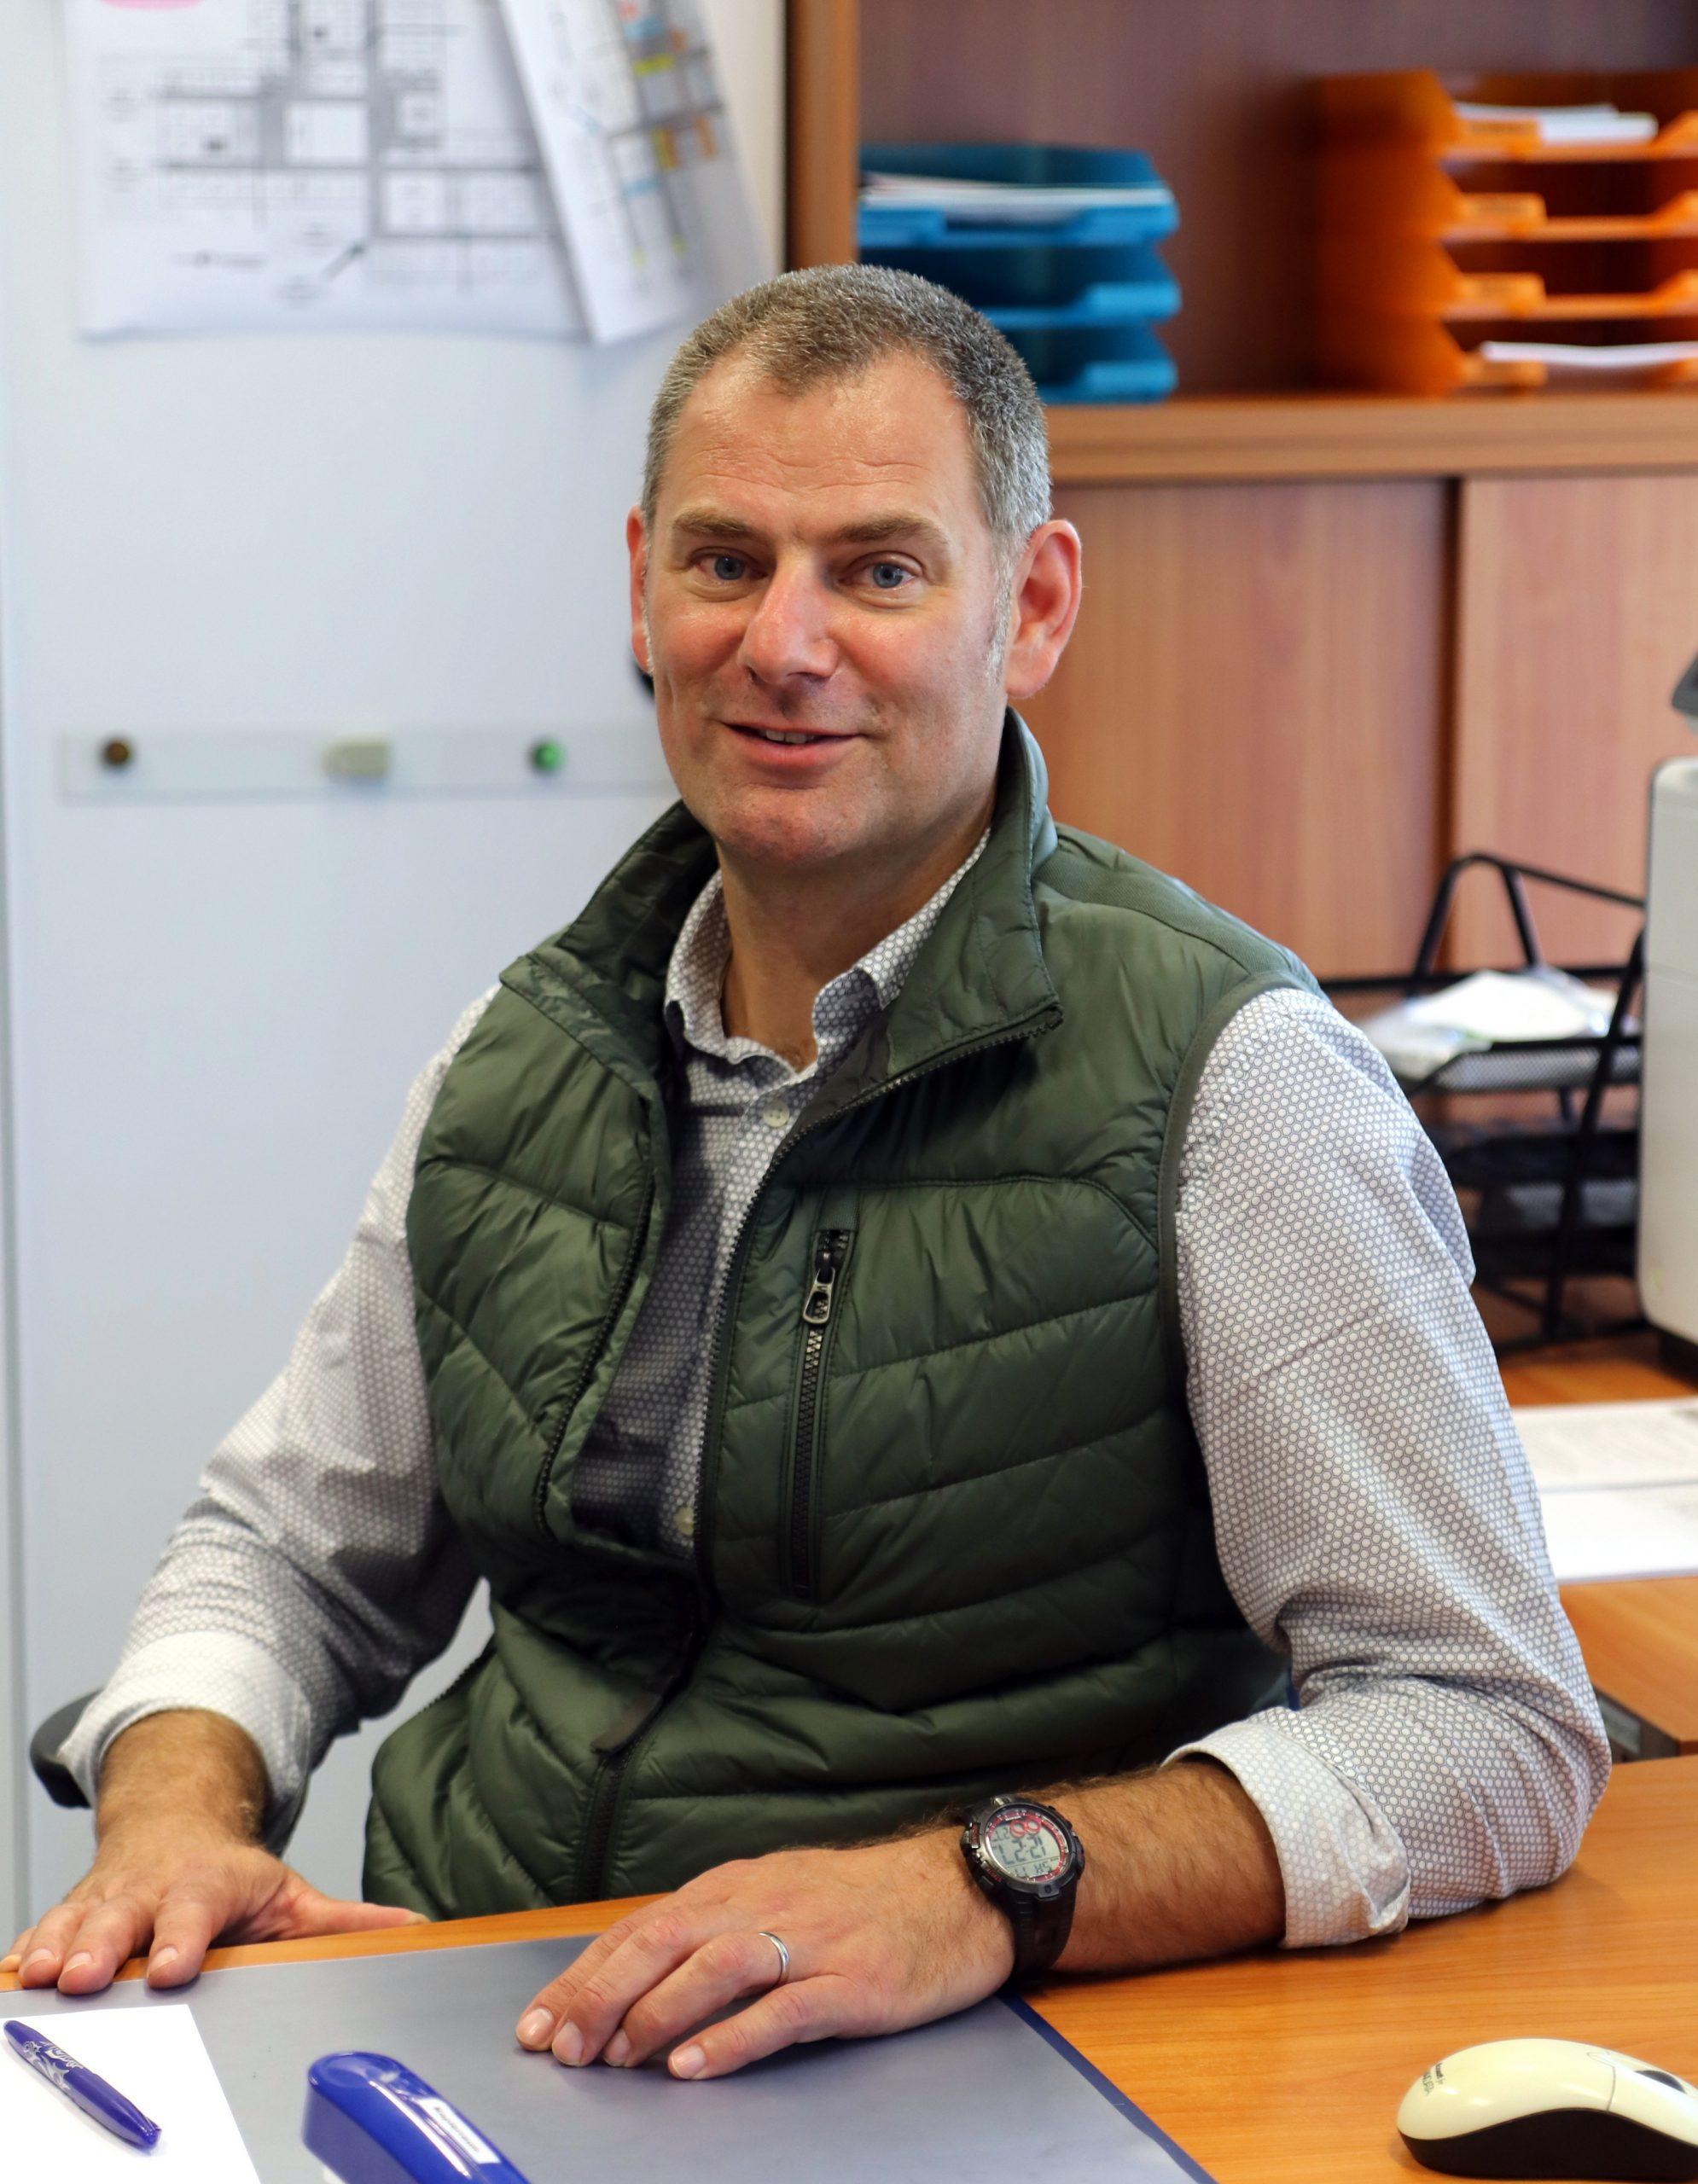 You are currently viewing Christian Maurer ist jetzt stellvertretender Schulleiter am GGE